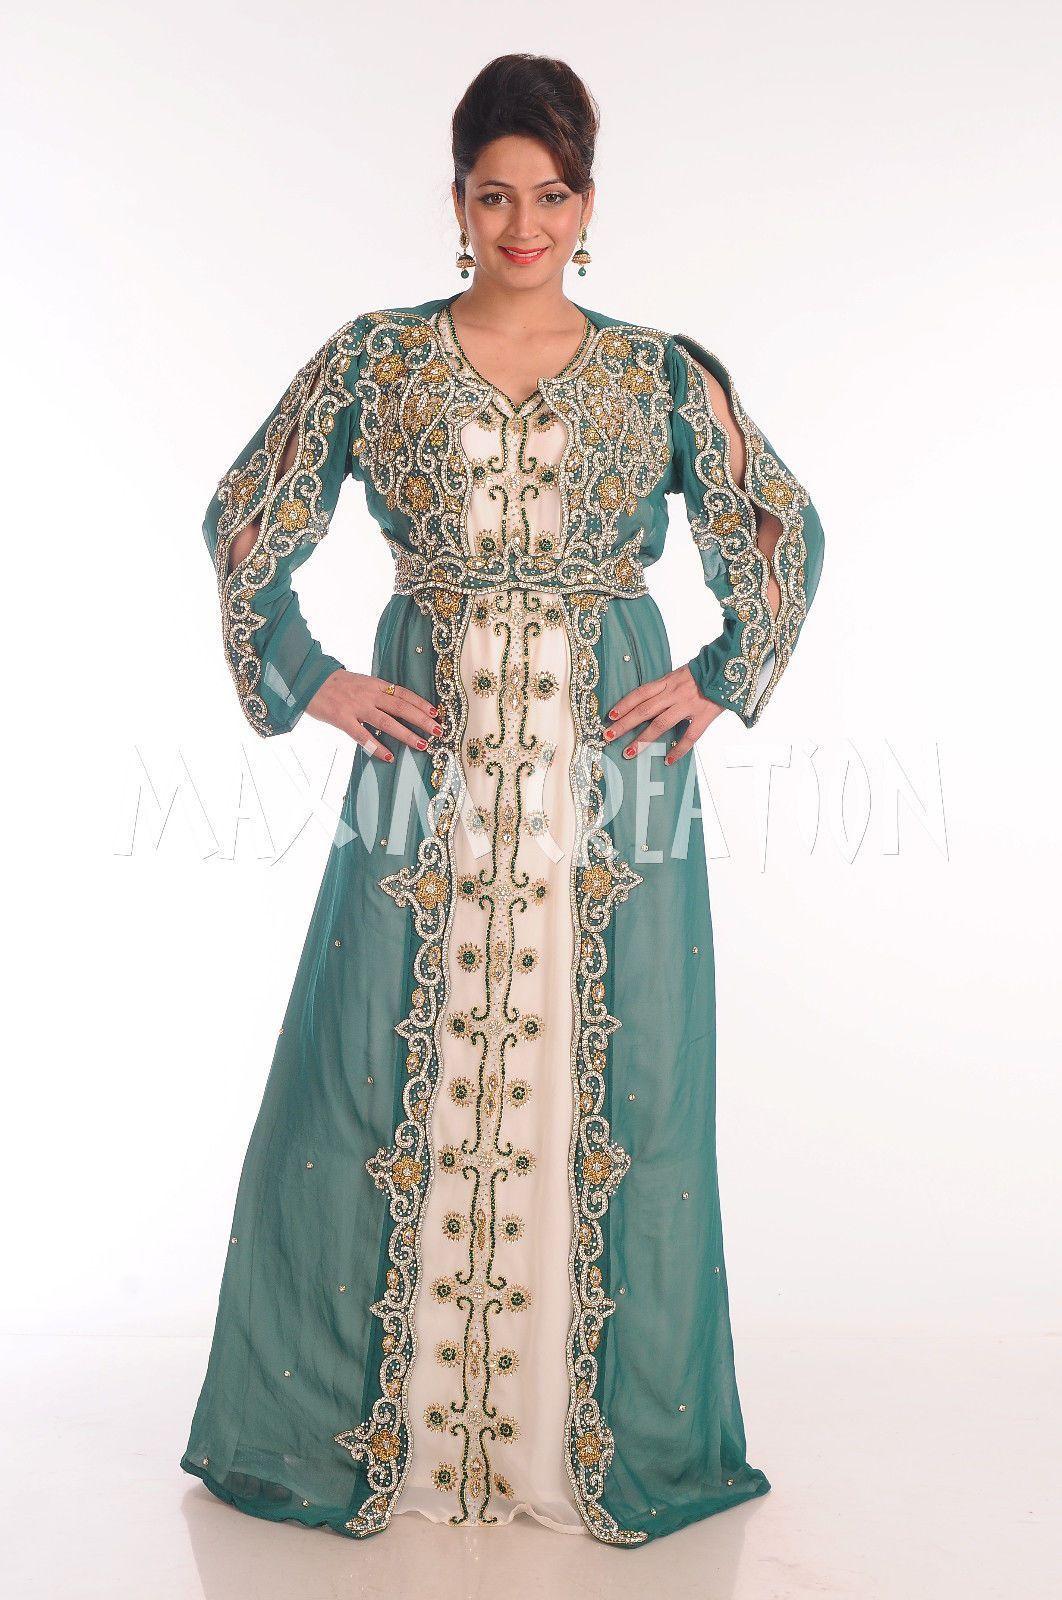 e19904c568 Bridal Moroccan Caftan Wedding Gown Party Wear Thobe Jalabiya Jilbab Dress  4871